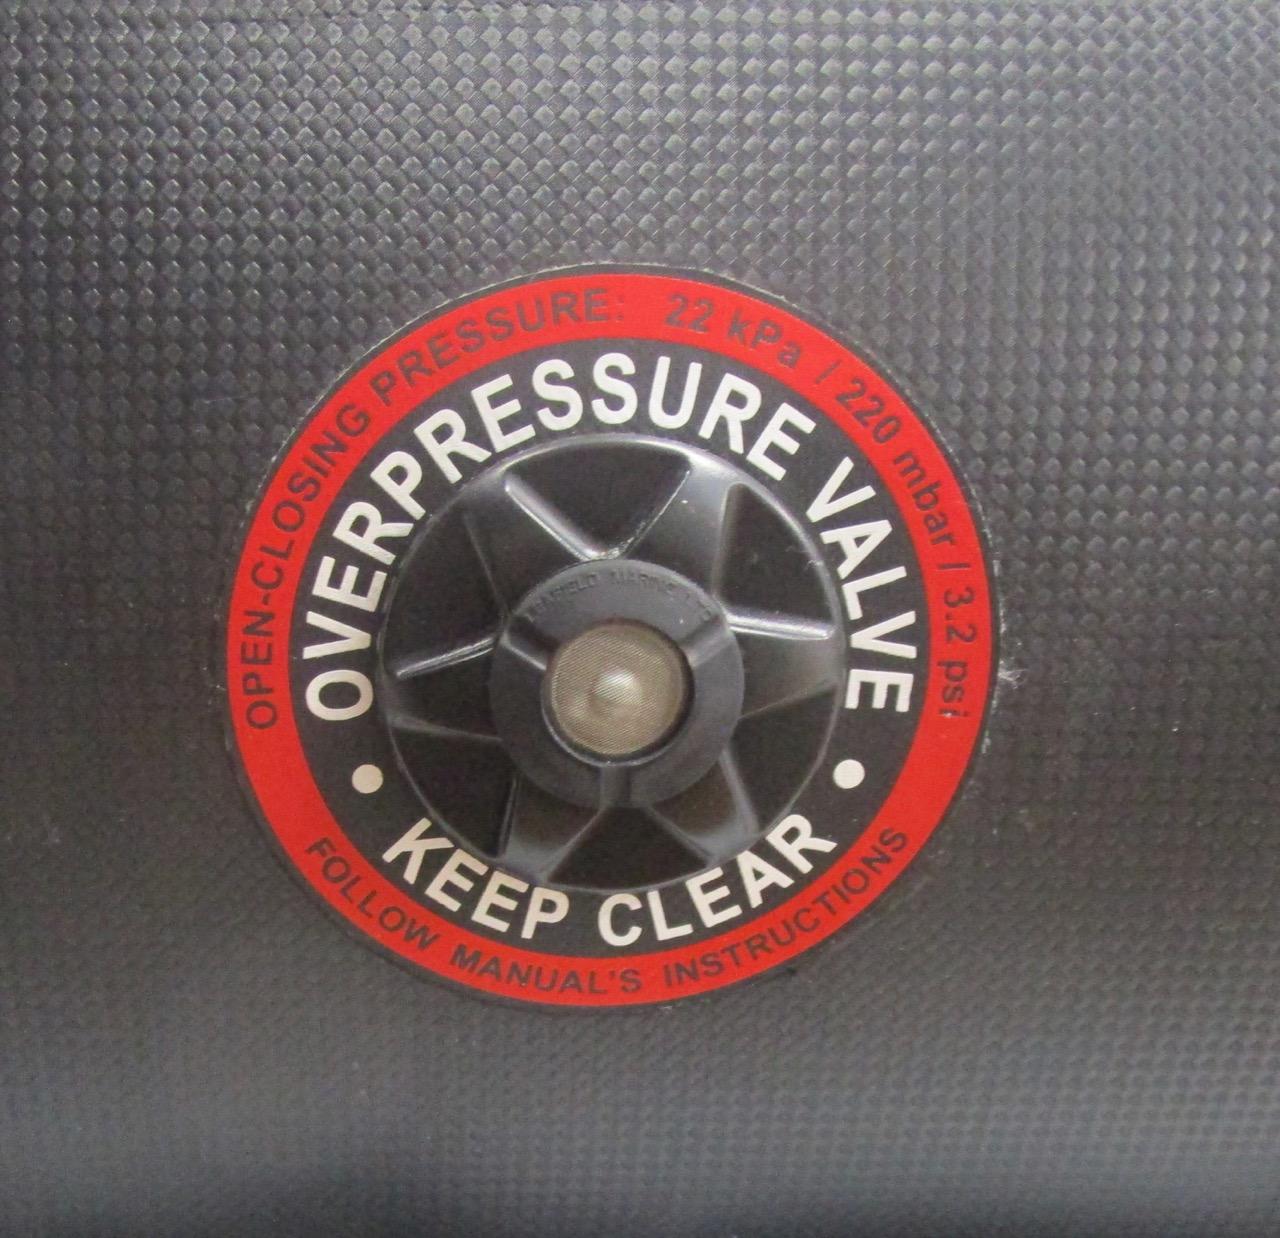 GRAND G750 RIB over pressure release valves